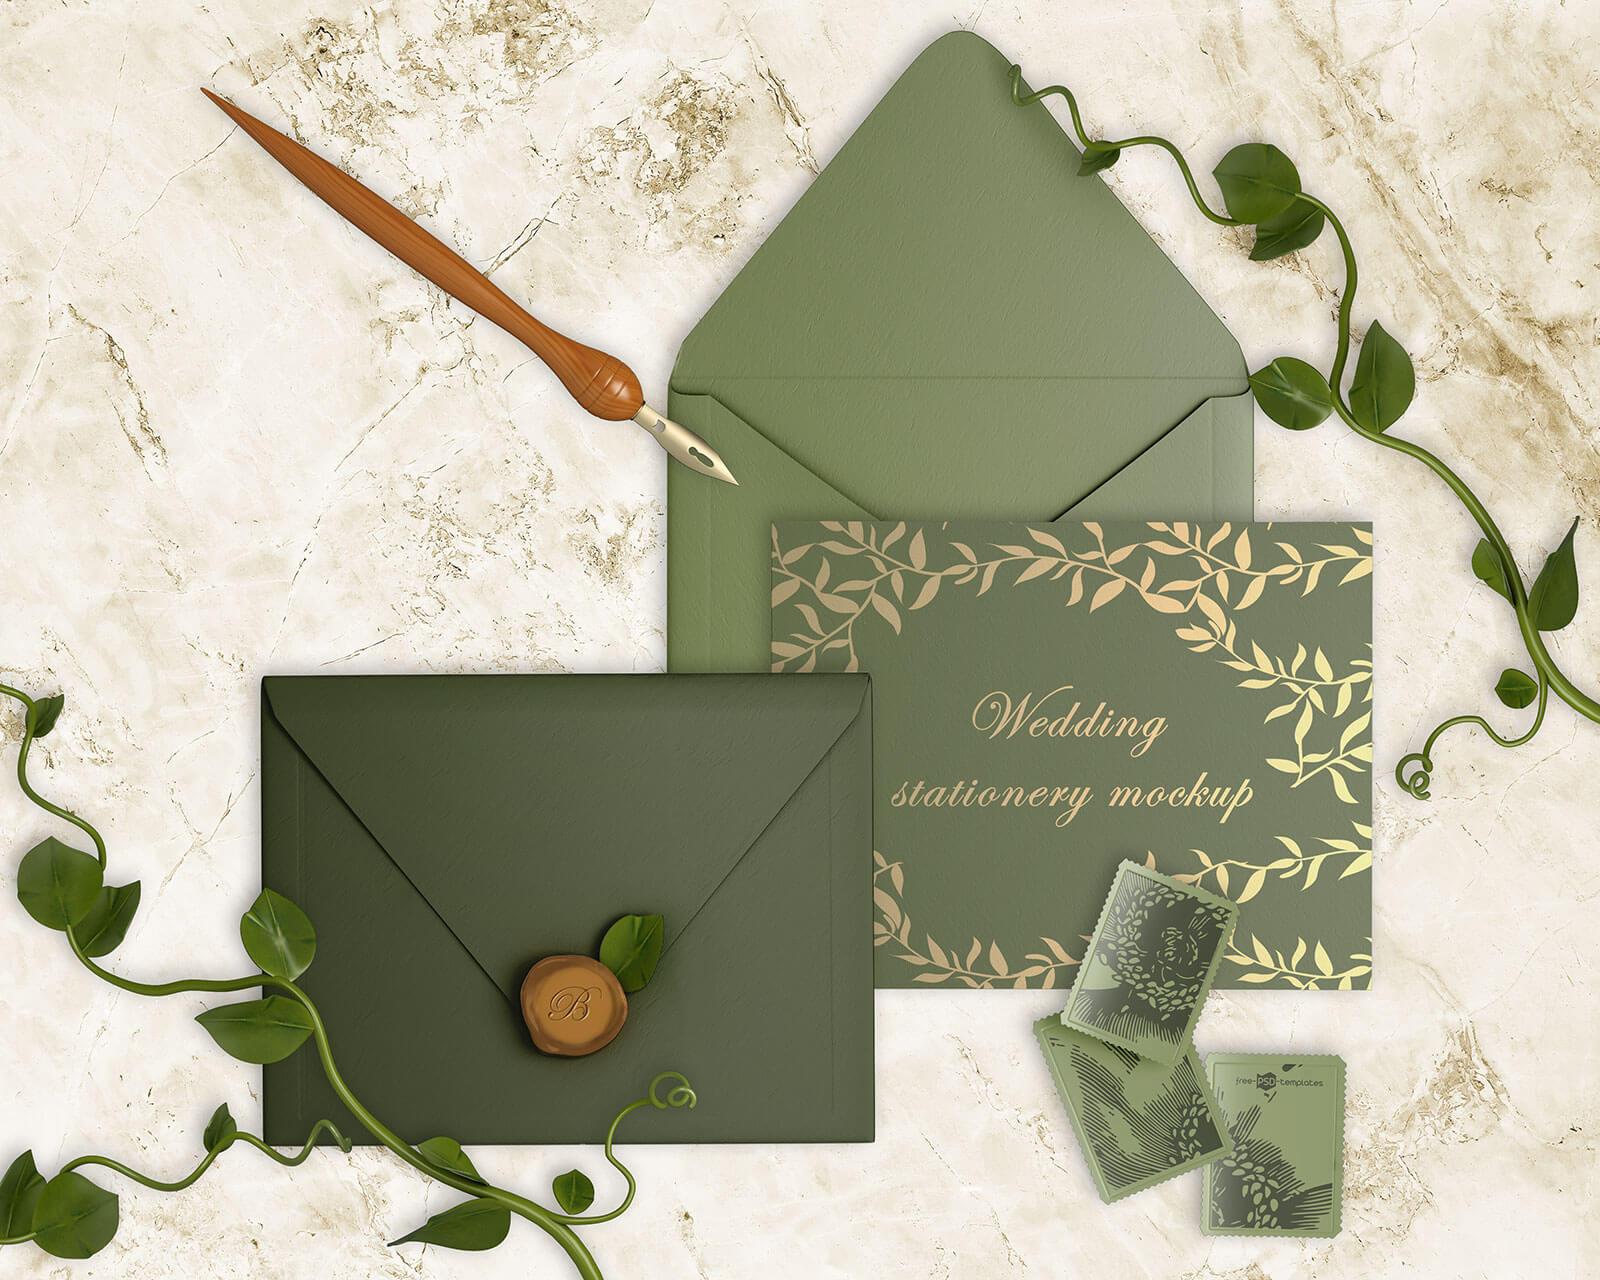 Free-invitation-Wedding-Card-&-Envelop-Mockup-PSD-Set-2